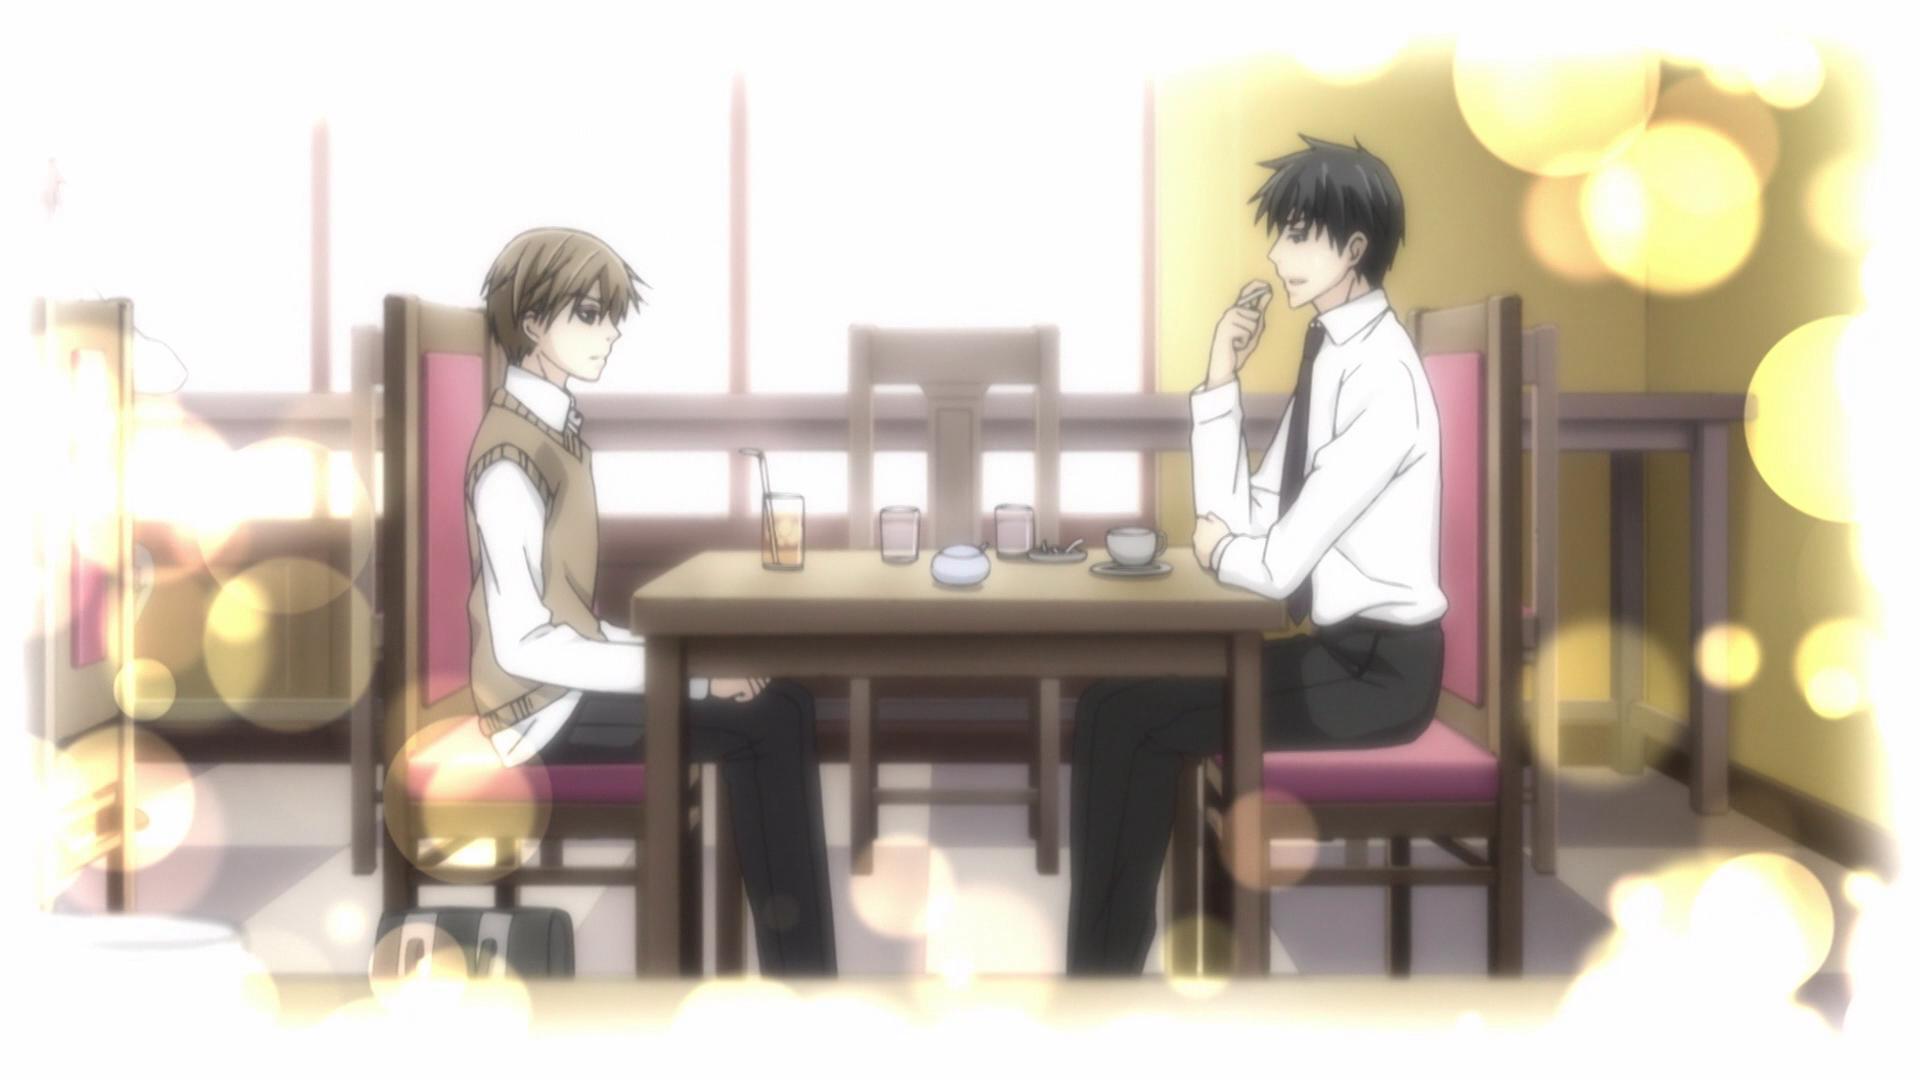 junjou romantica episode 1